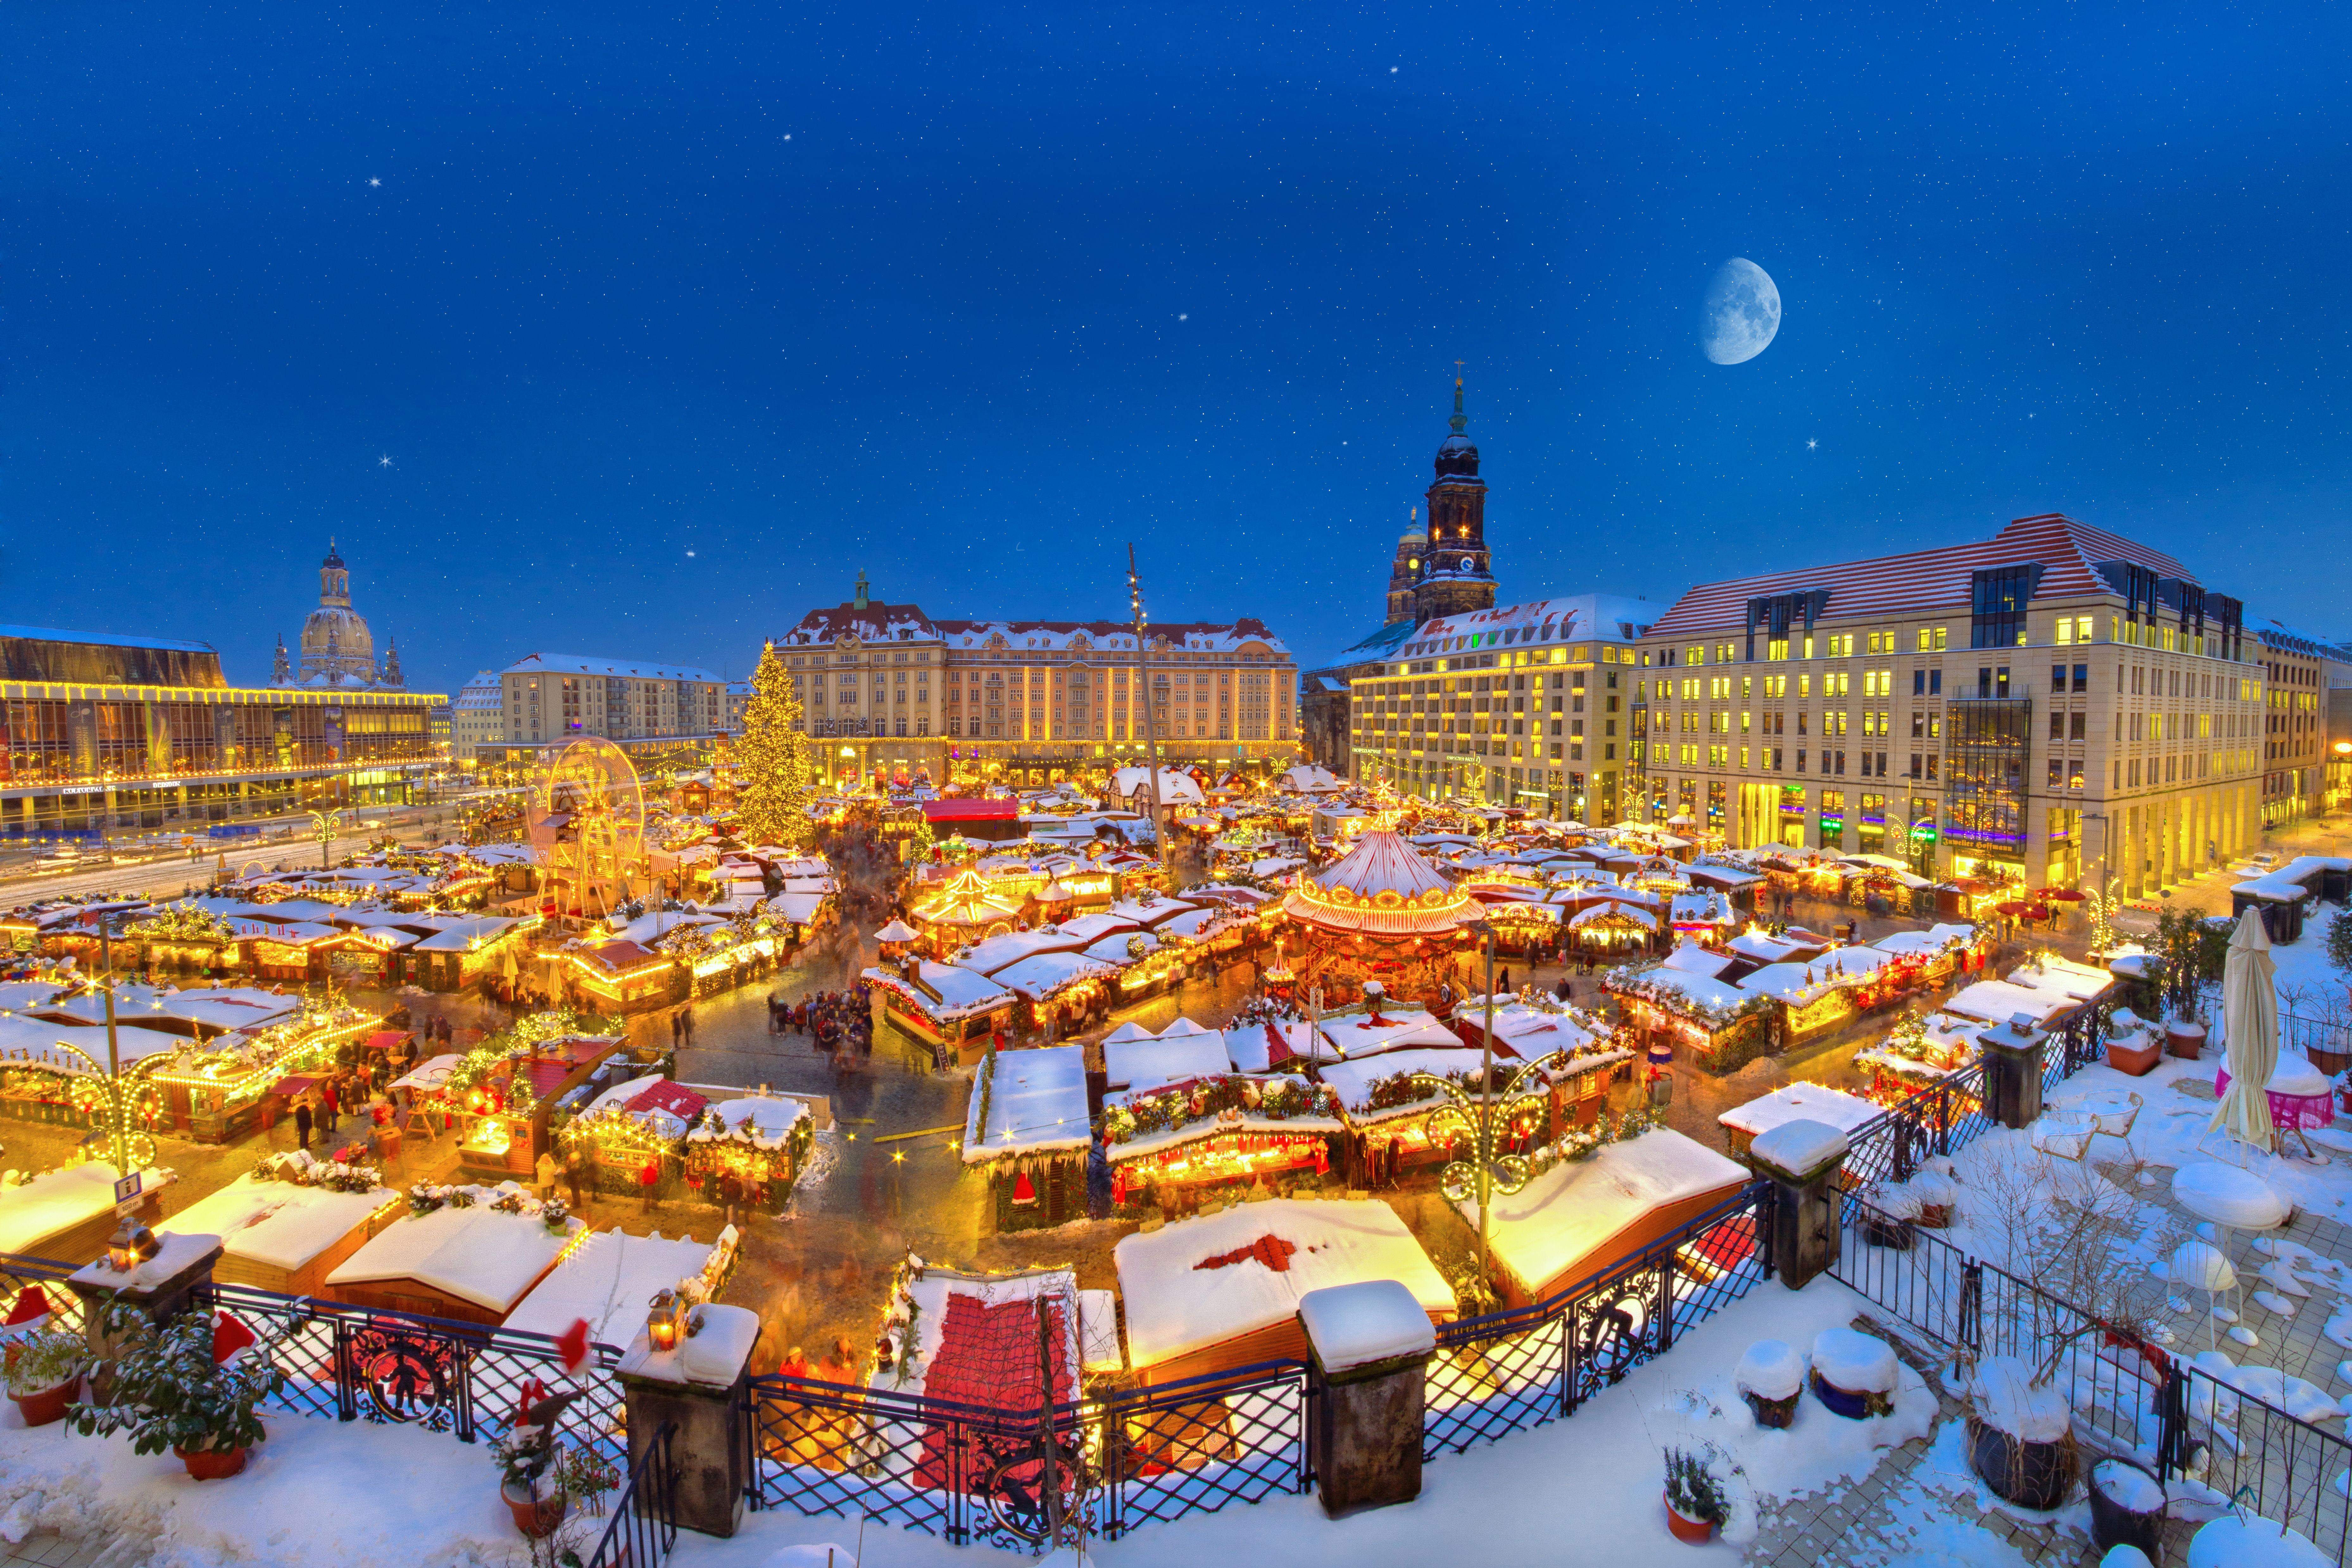 mercato-natale-dresda-credit-Torsten-Hufsky